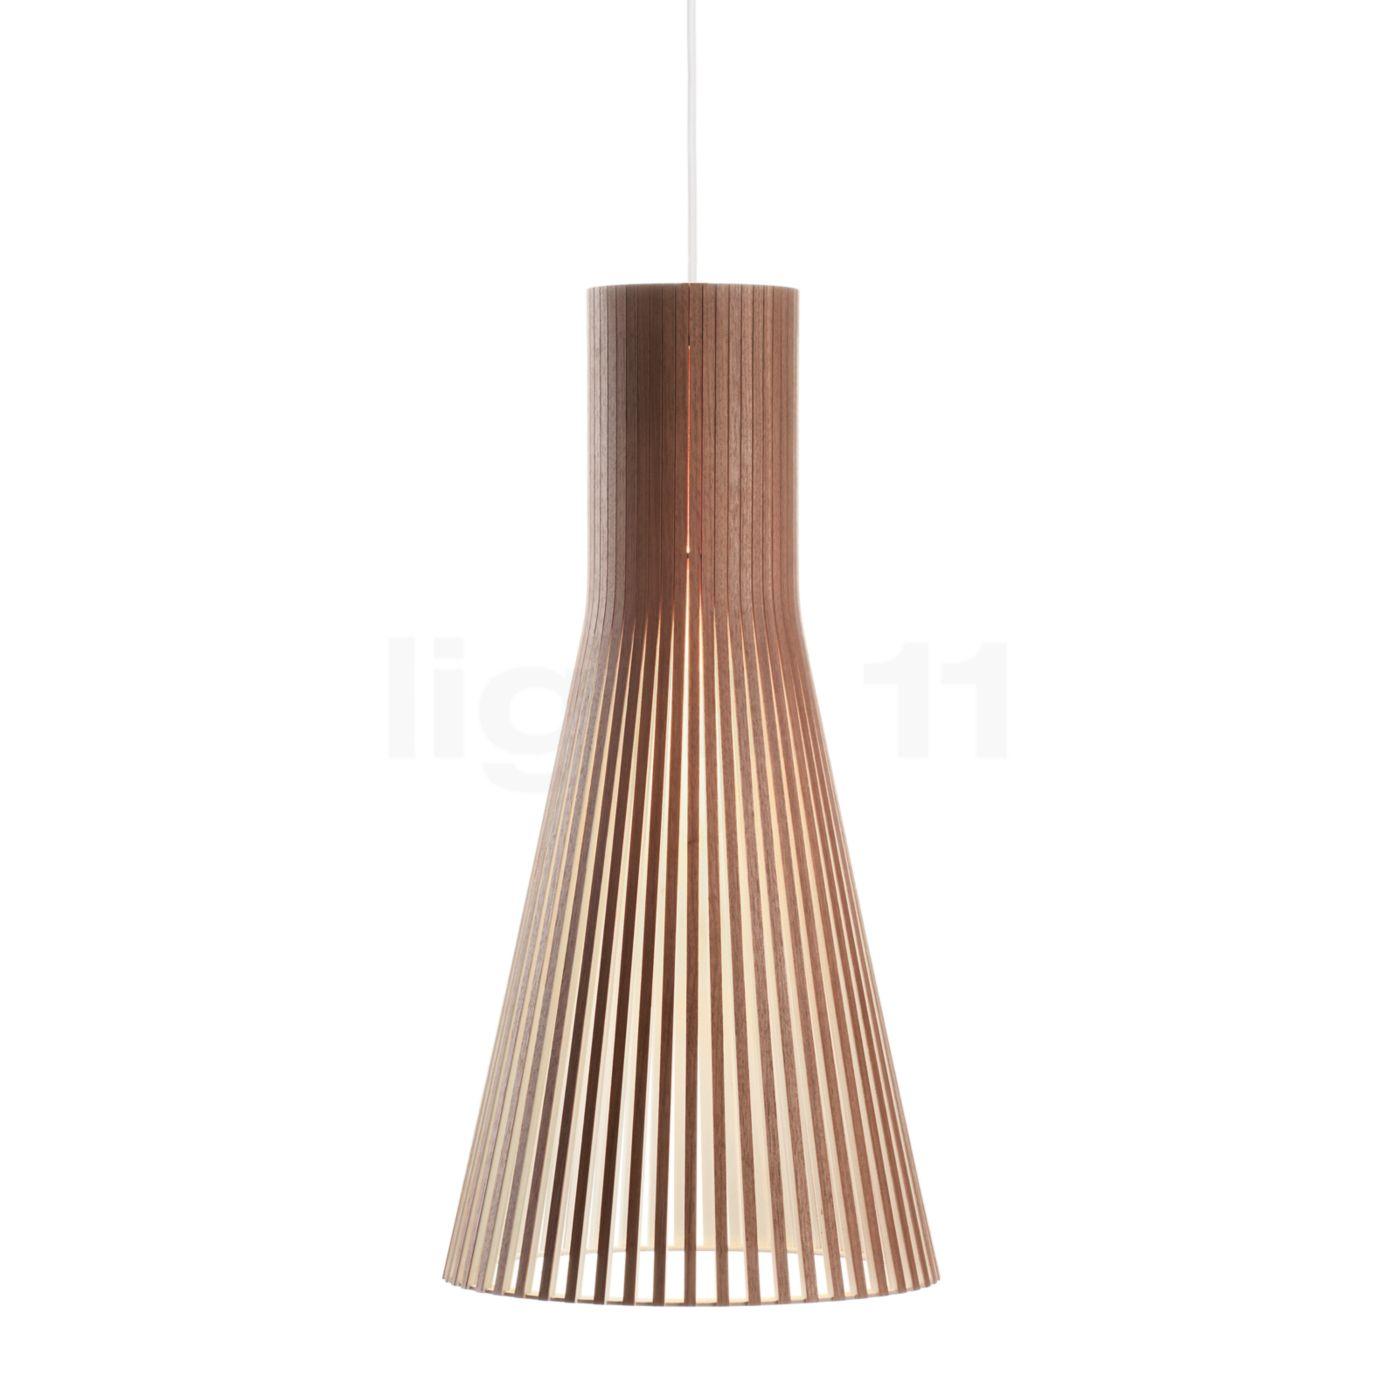 Design 4200 Kaufen Secto Bei Pendelleuchte CodxeB